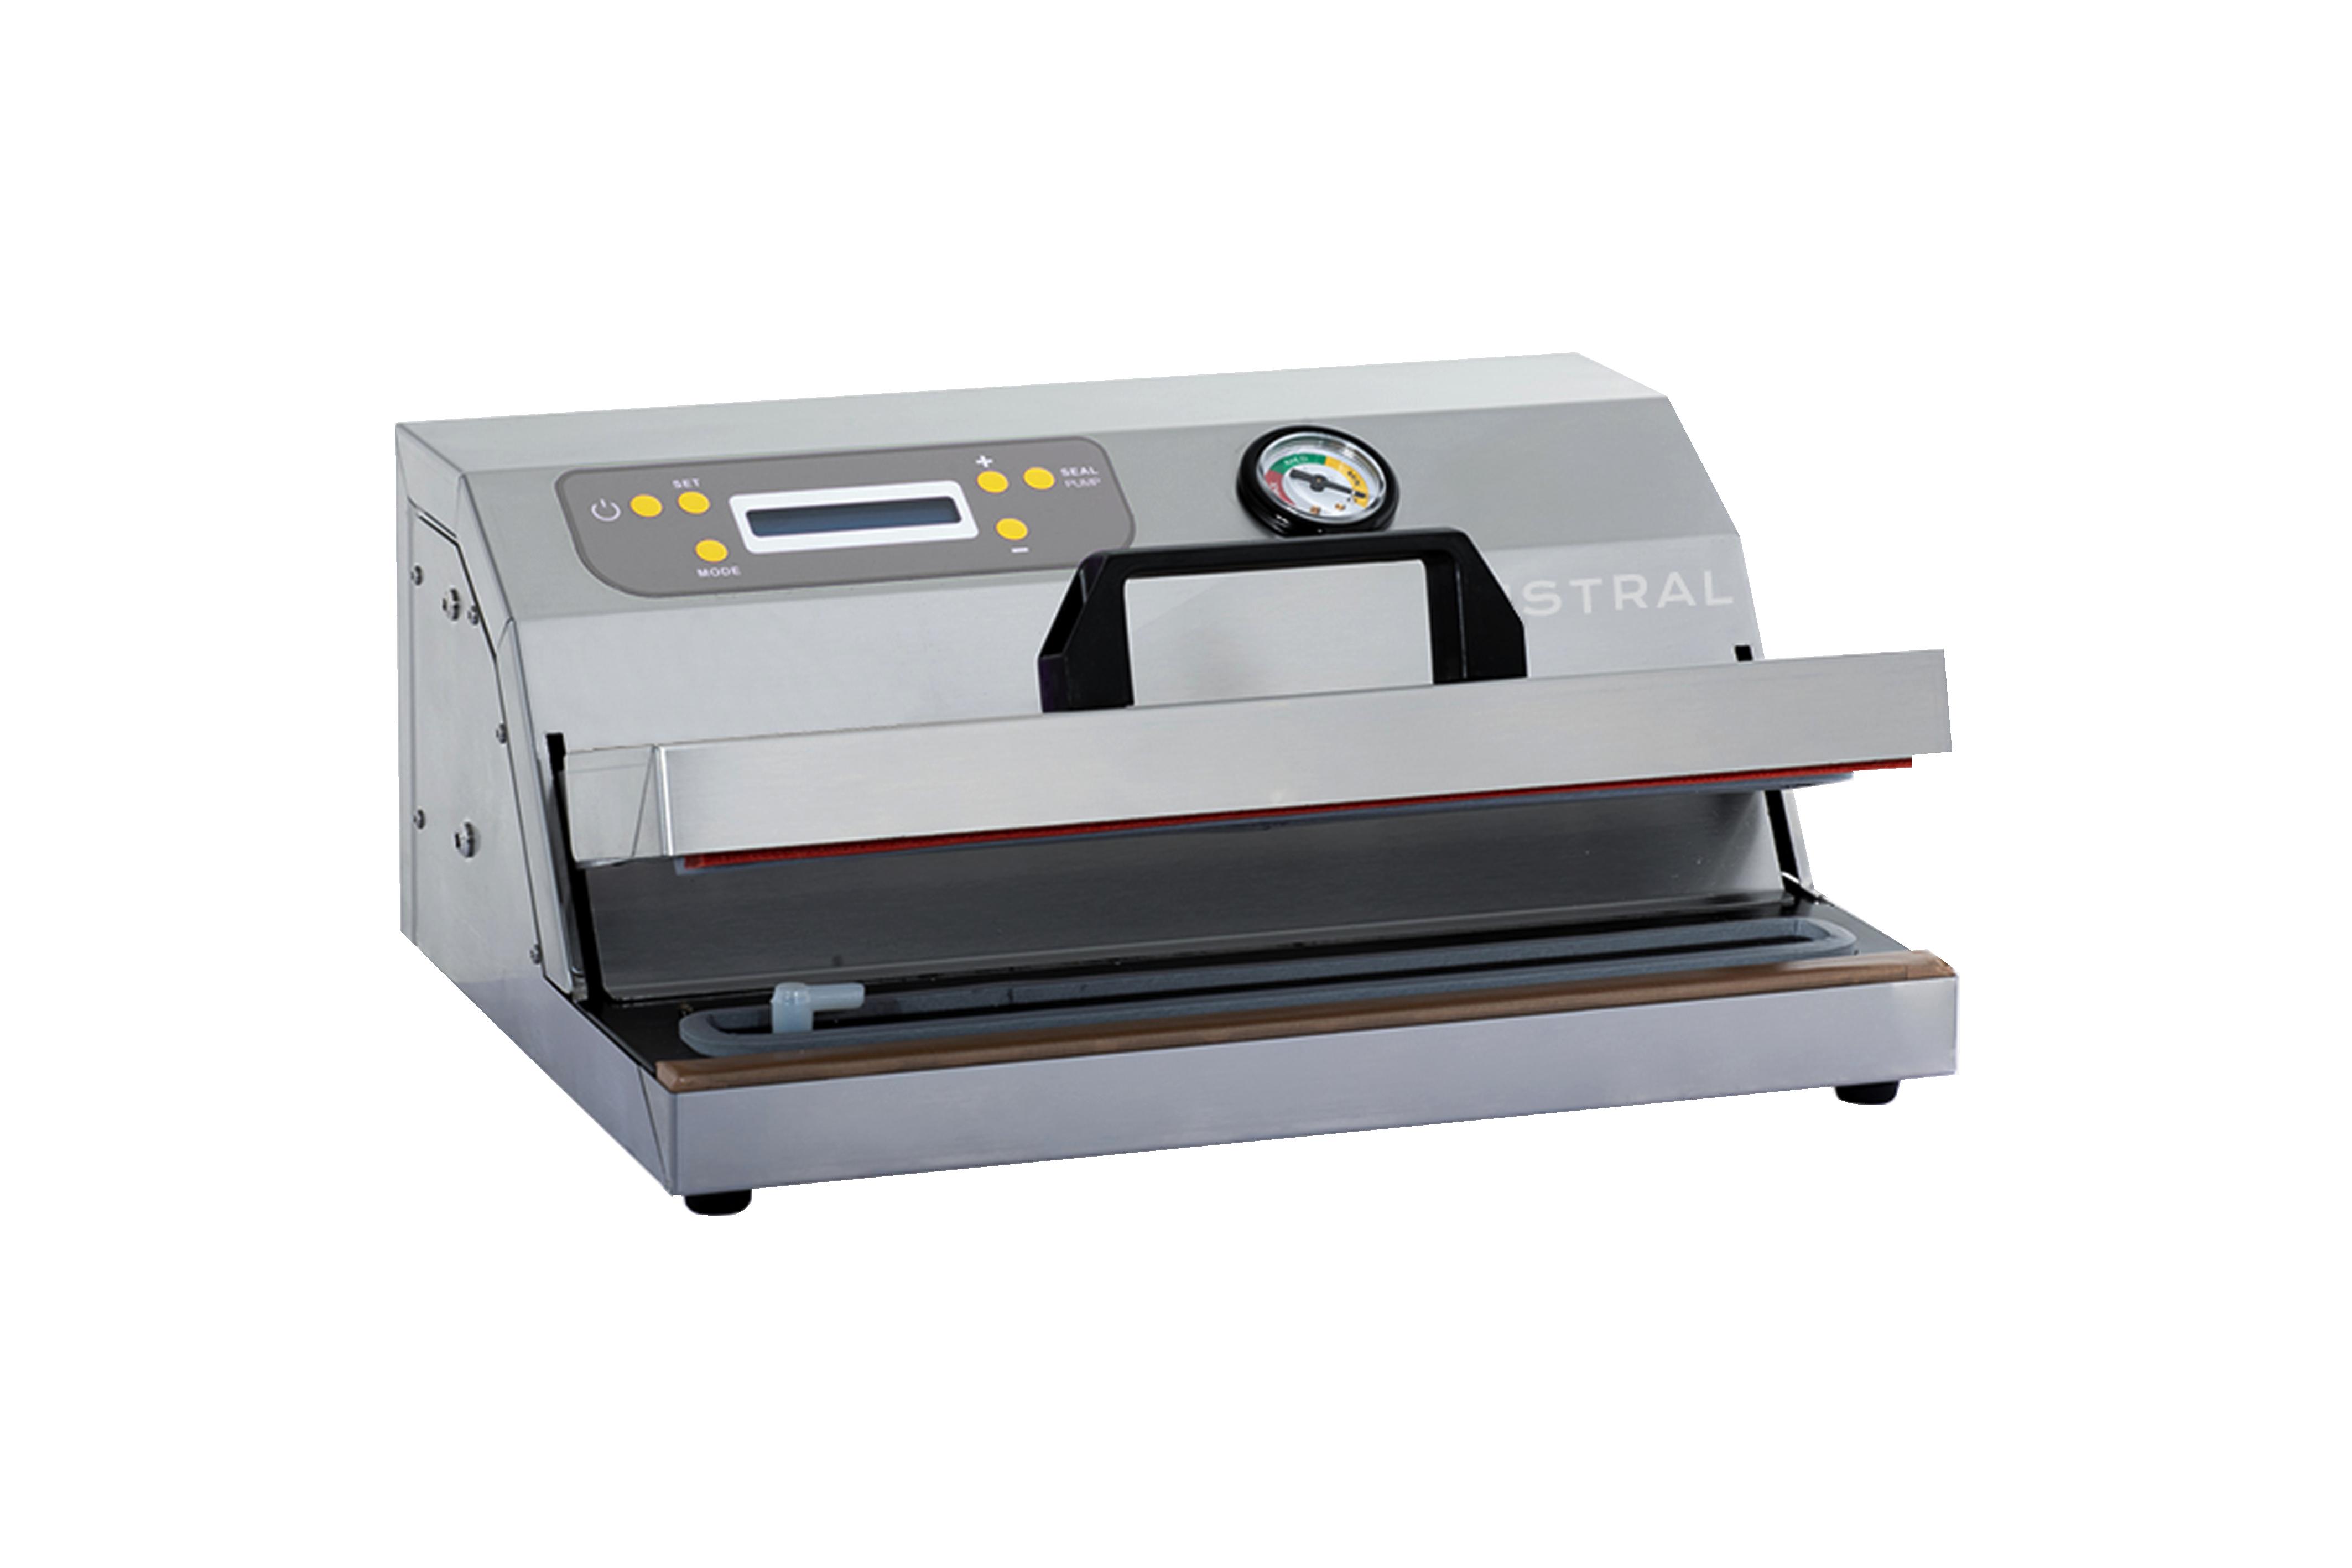 Eurodib USA Mistral external vacuum packaging machines